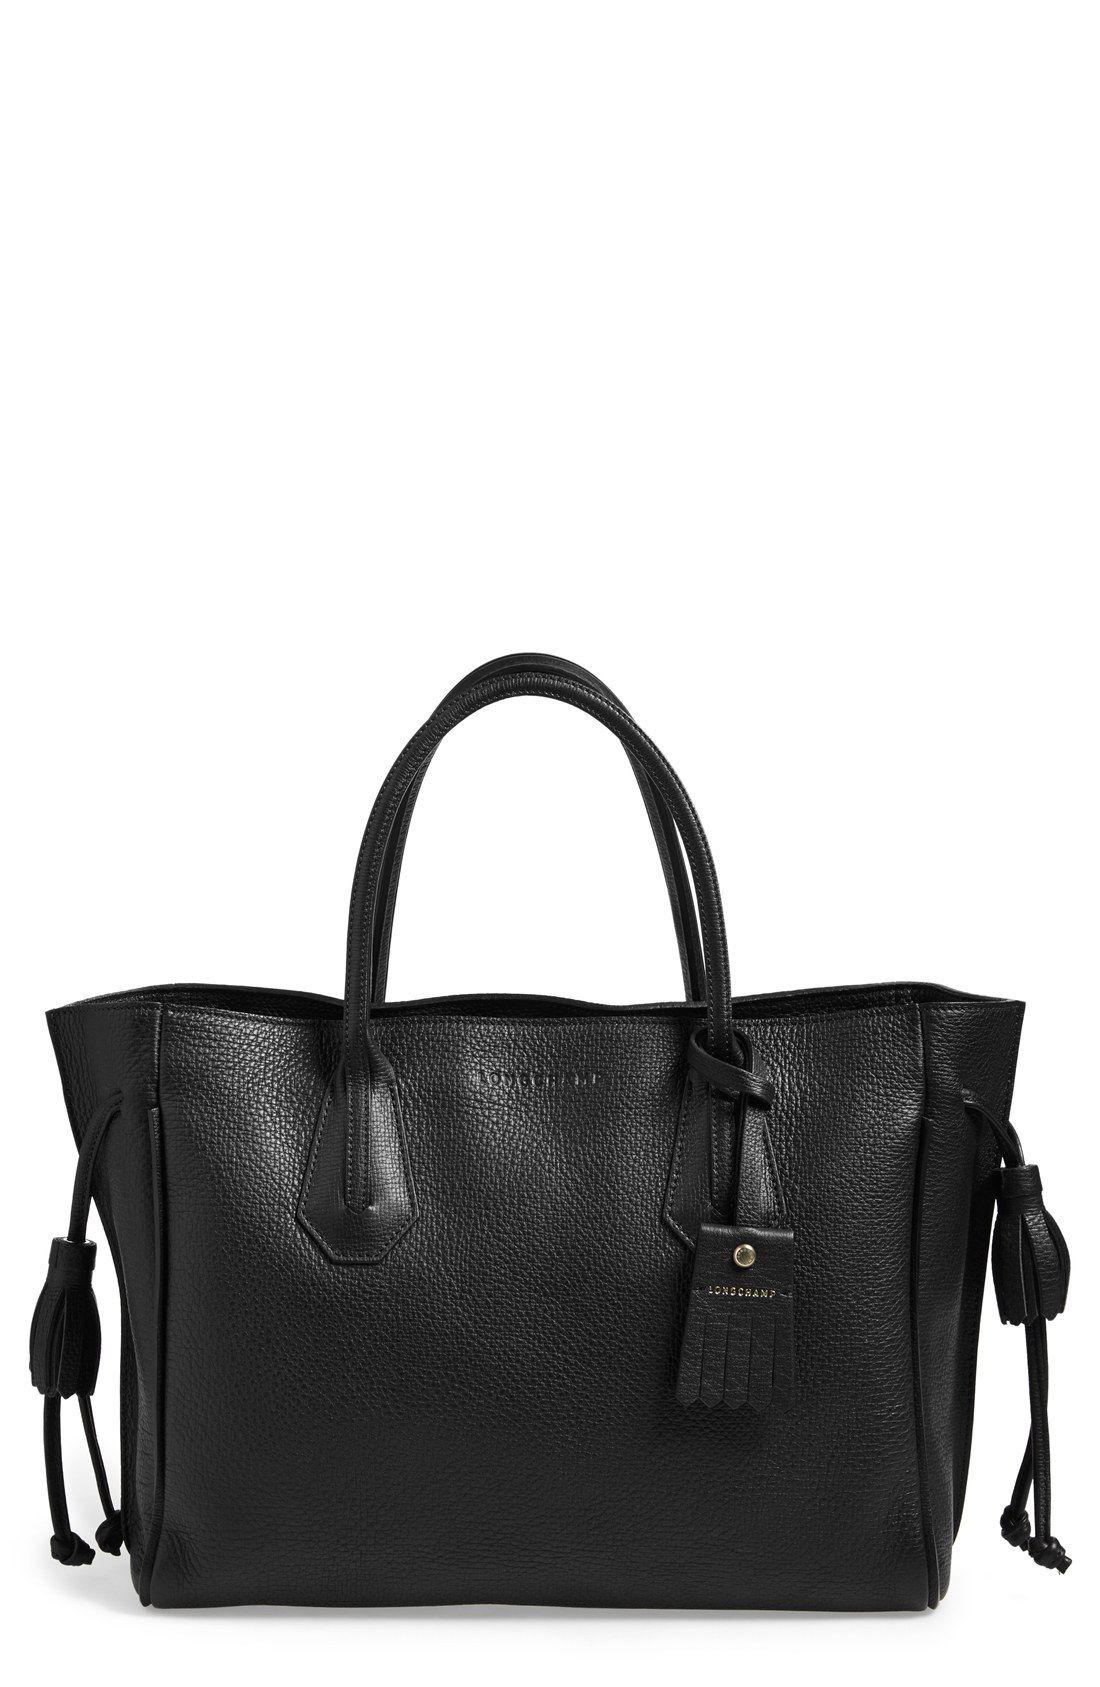 cd8ed6a90 Longchamp 'Medium Penelope' Tote   Fashion   Longchamp, Fashion ...